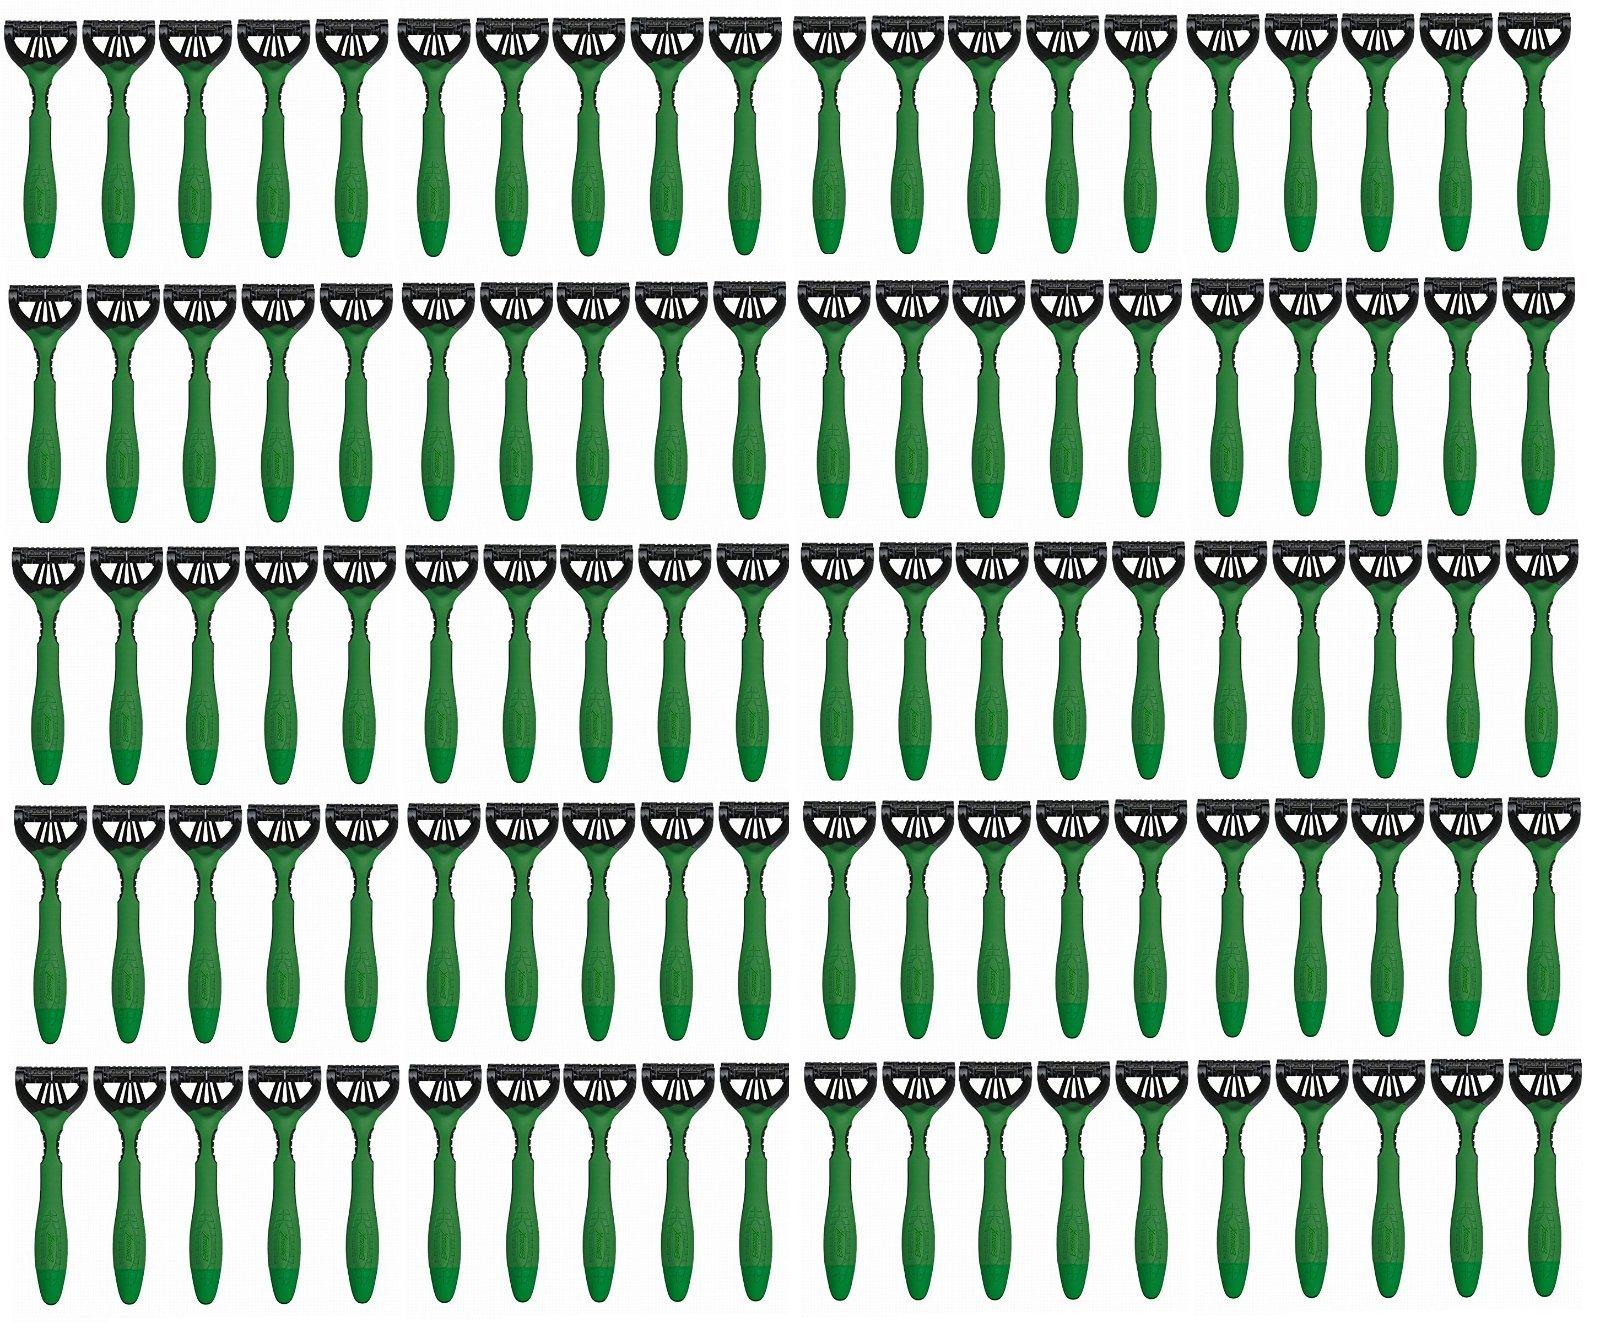 Schick Xtreme3 Disposables Razors Sensitive Vitamin E & Aloe, Green - Lot of 100 - Bulk Packaging